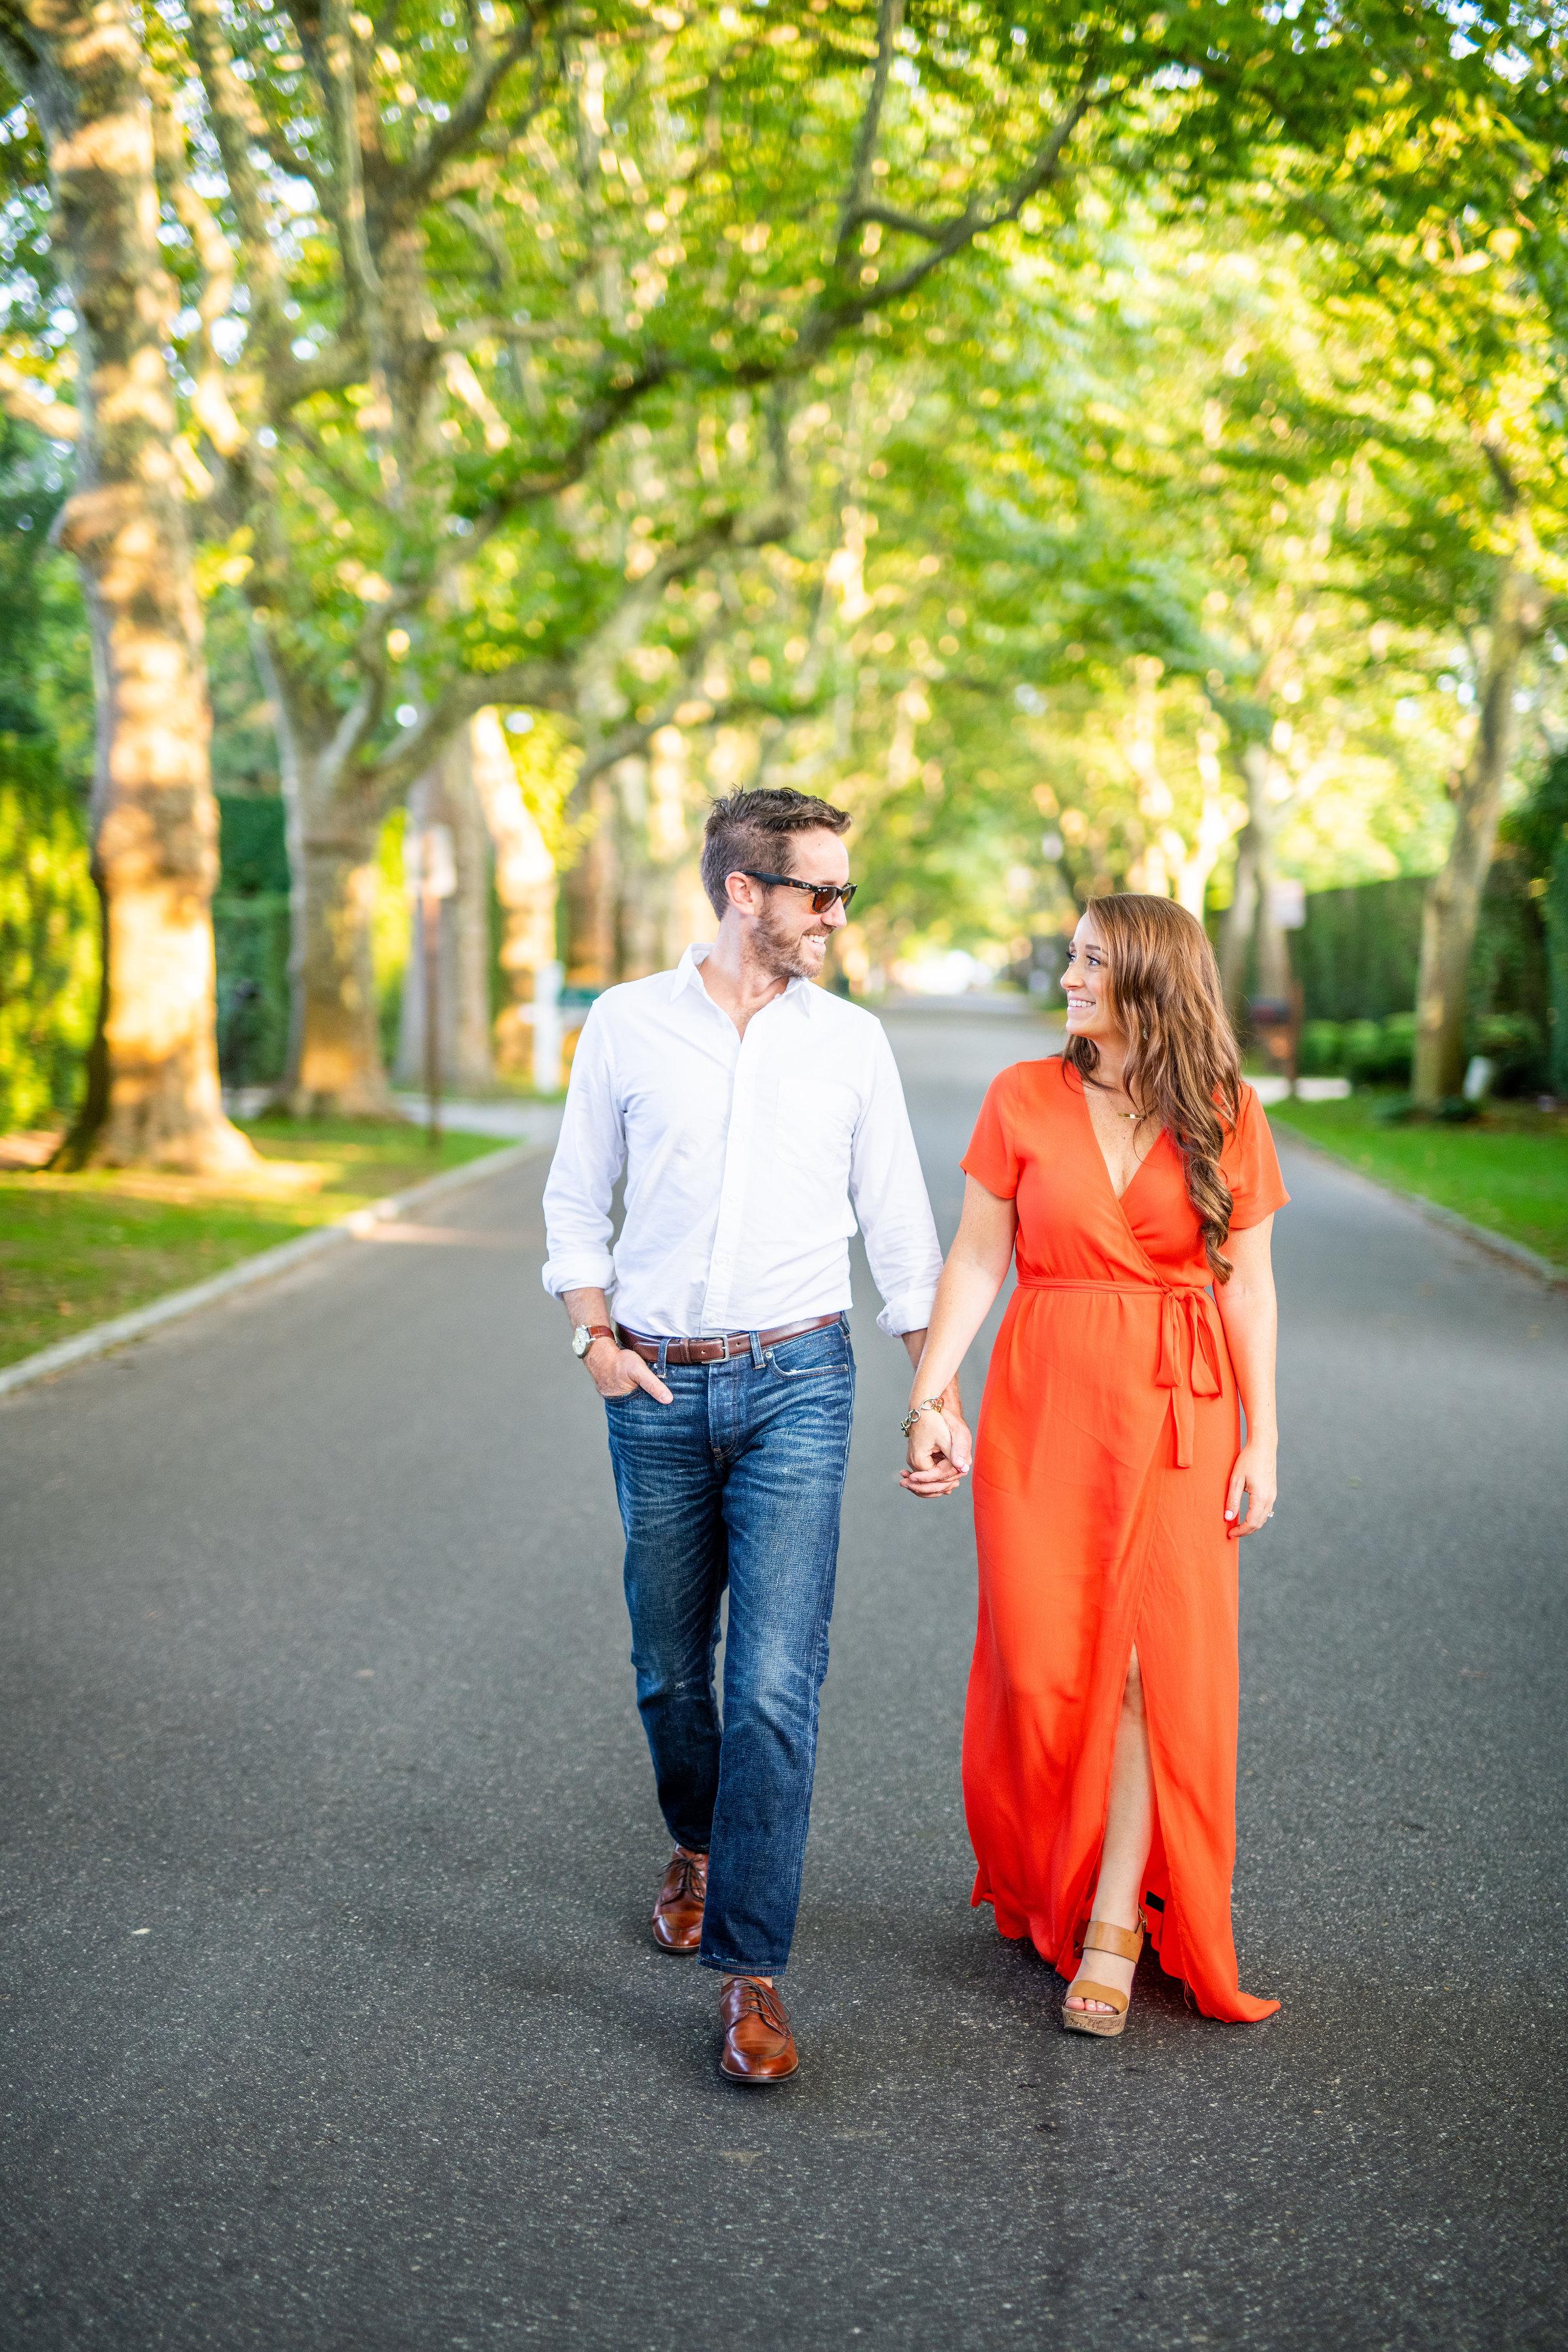 Southampton Engagement Shoot | Southampton Wedding Photographer | Hamptons Engagement Shoot | Hamptons Wedding Photographer15